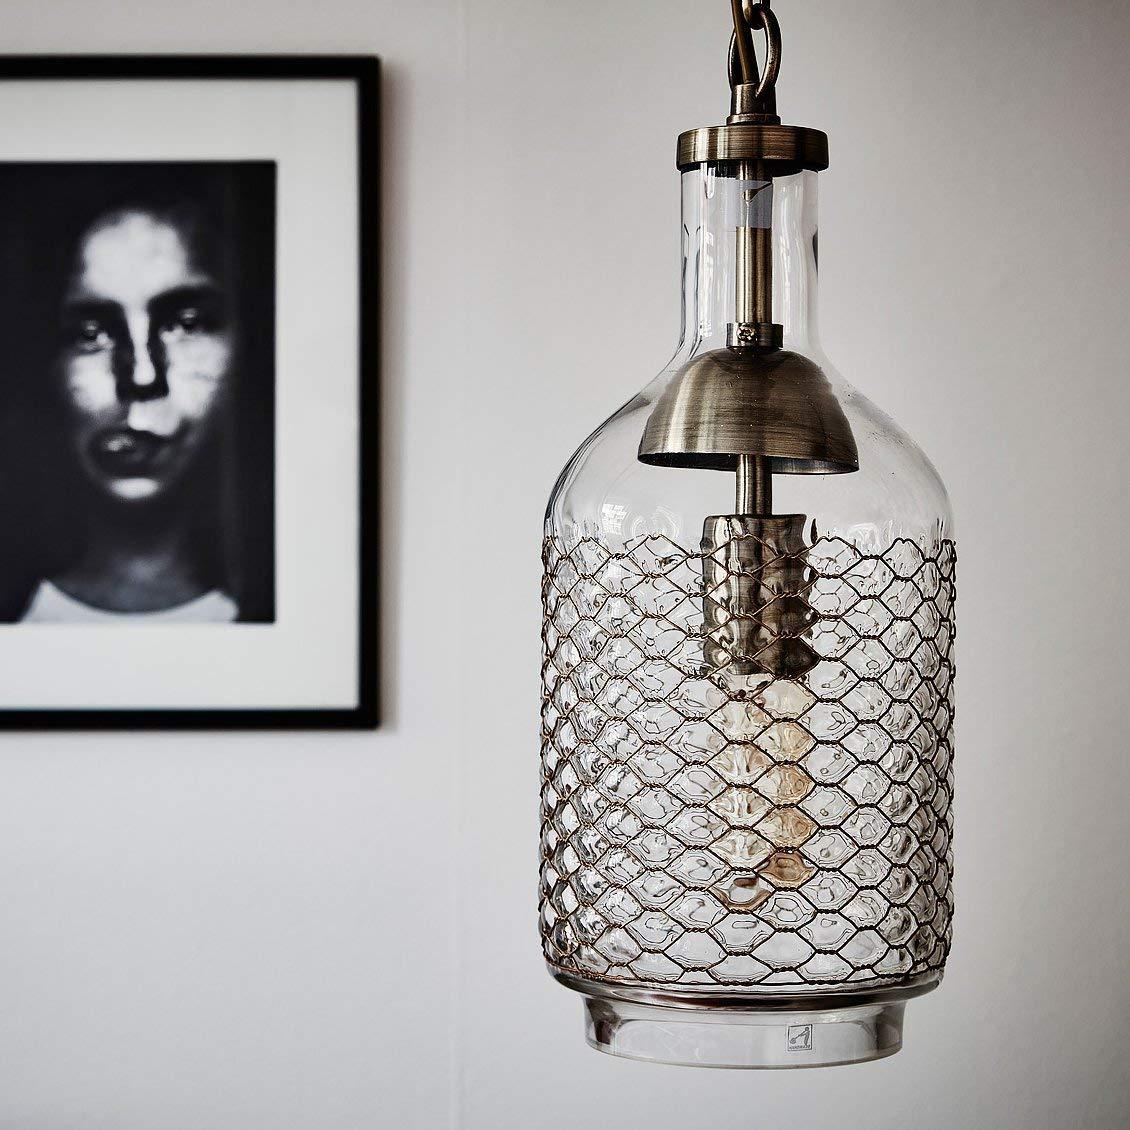 Y.H.Valuable Pendant Lights Industrial Edison Vintage Hand Blown Glass Pendant Light, 1 Hanging Light -Living Room Dining Hall Aisle Glass Chandelier -Lighting & Ceiling Fans